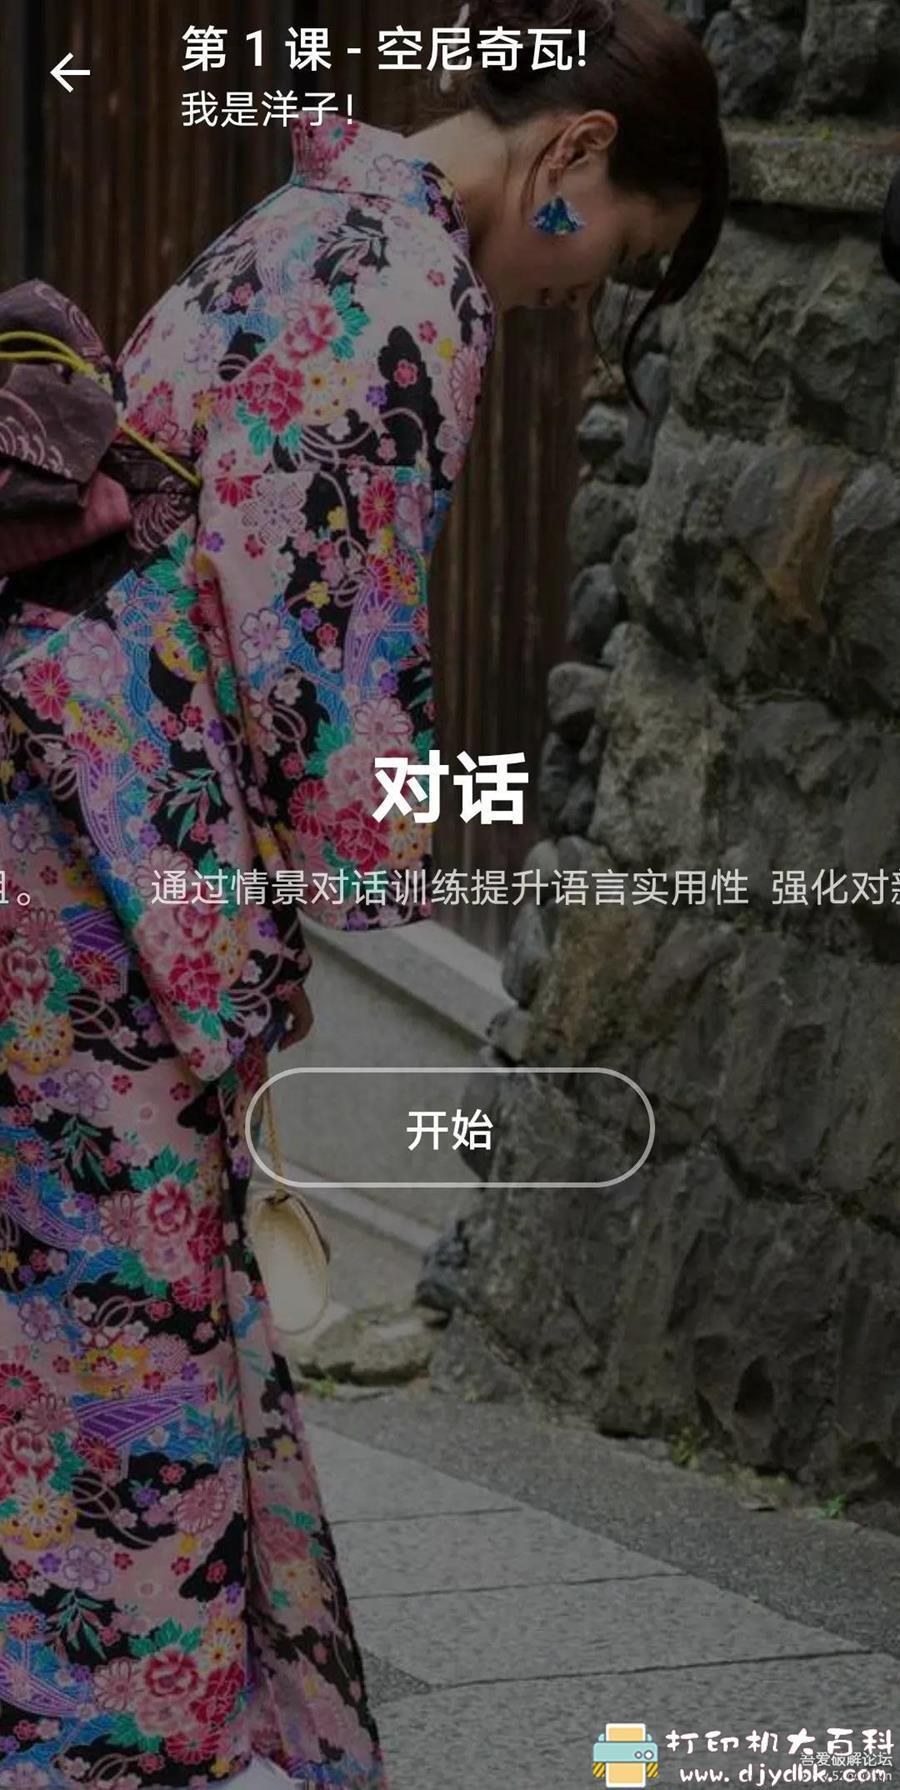 [Android]学习外语的软件 博说【已破解永久VIP】图片 No.5